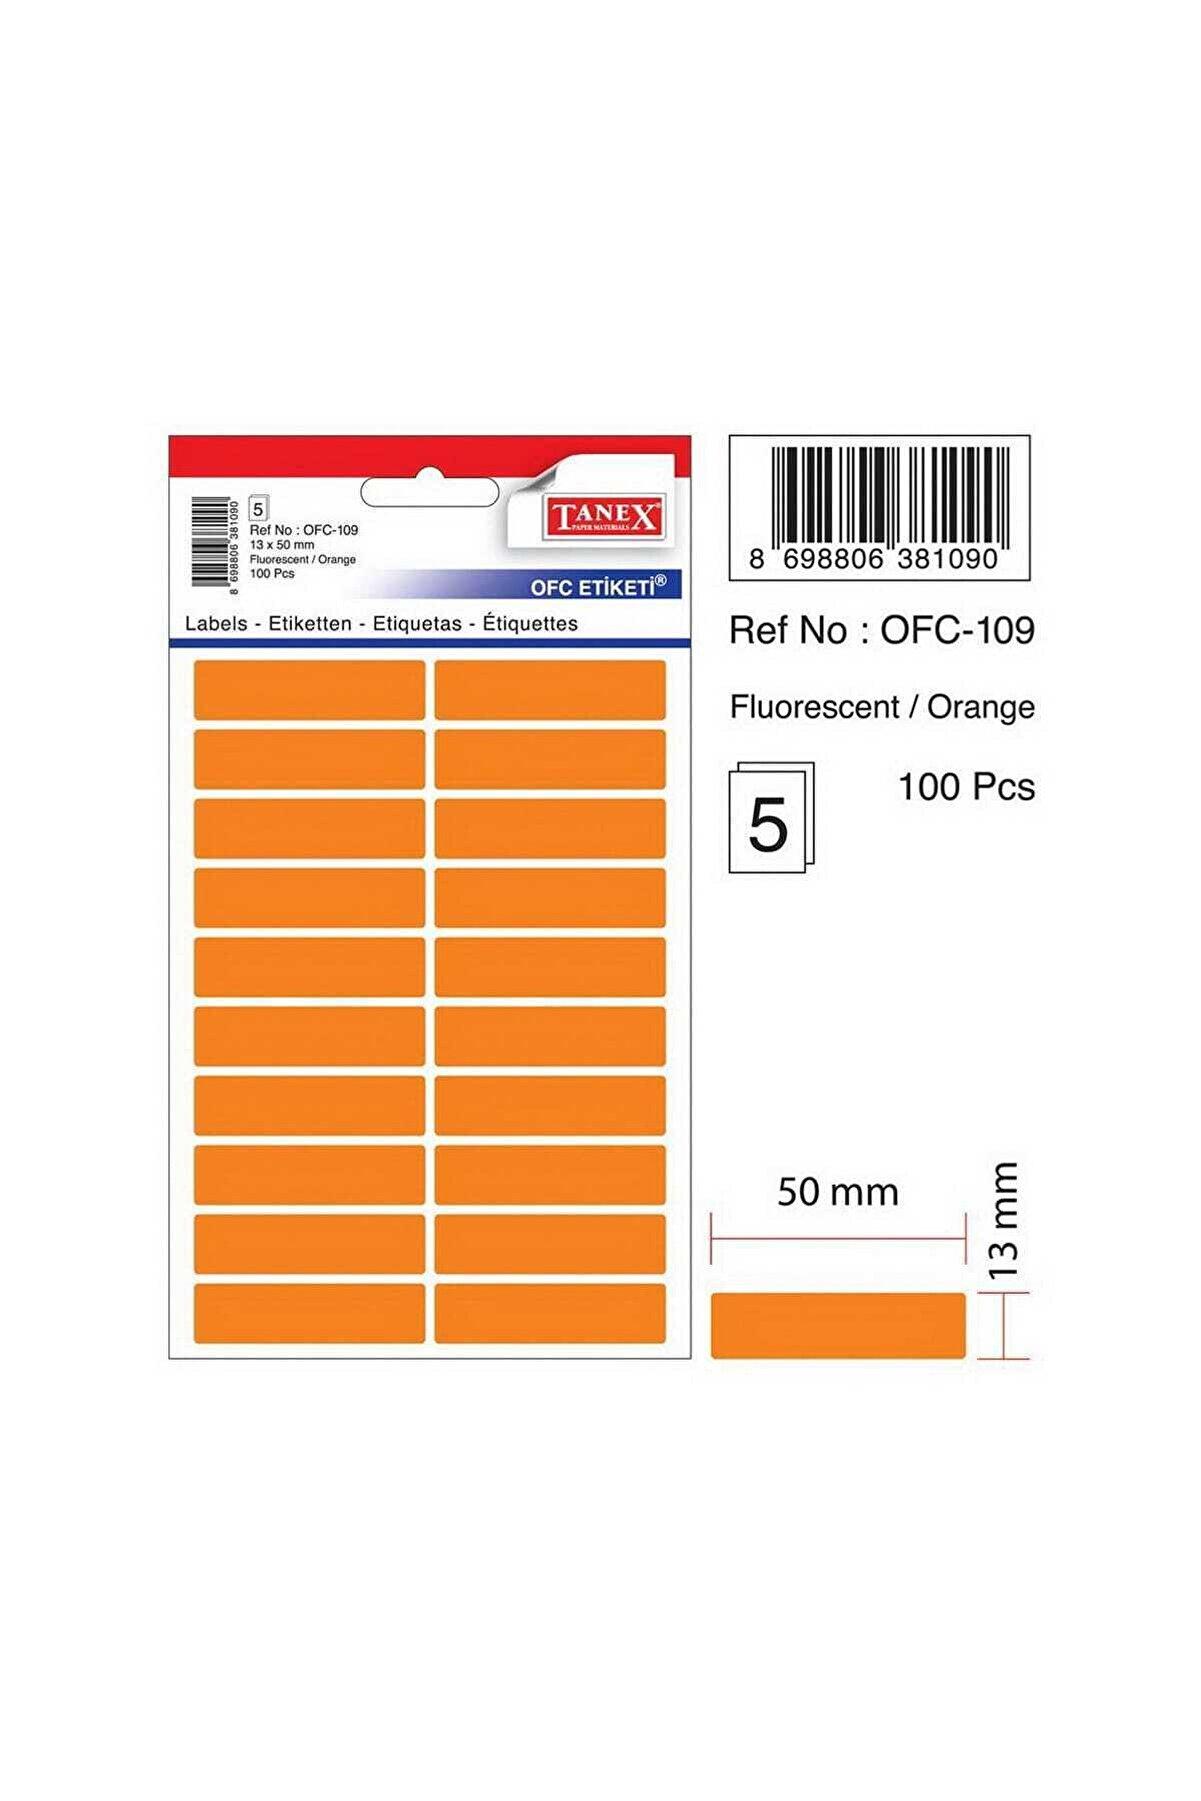 Tanex Ofc-109 Çıkartma Etiket 50x13 Mm (beyaz 200 Lü - Renkliler 100 Lü Paket)